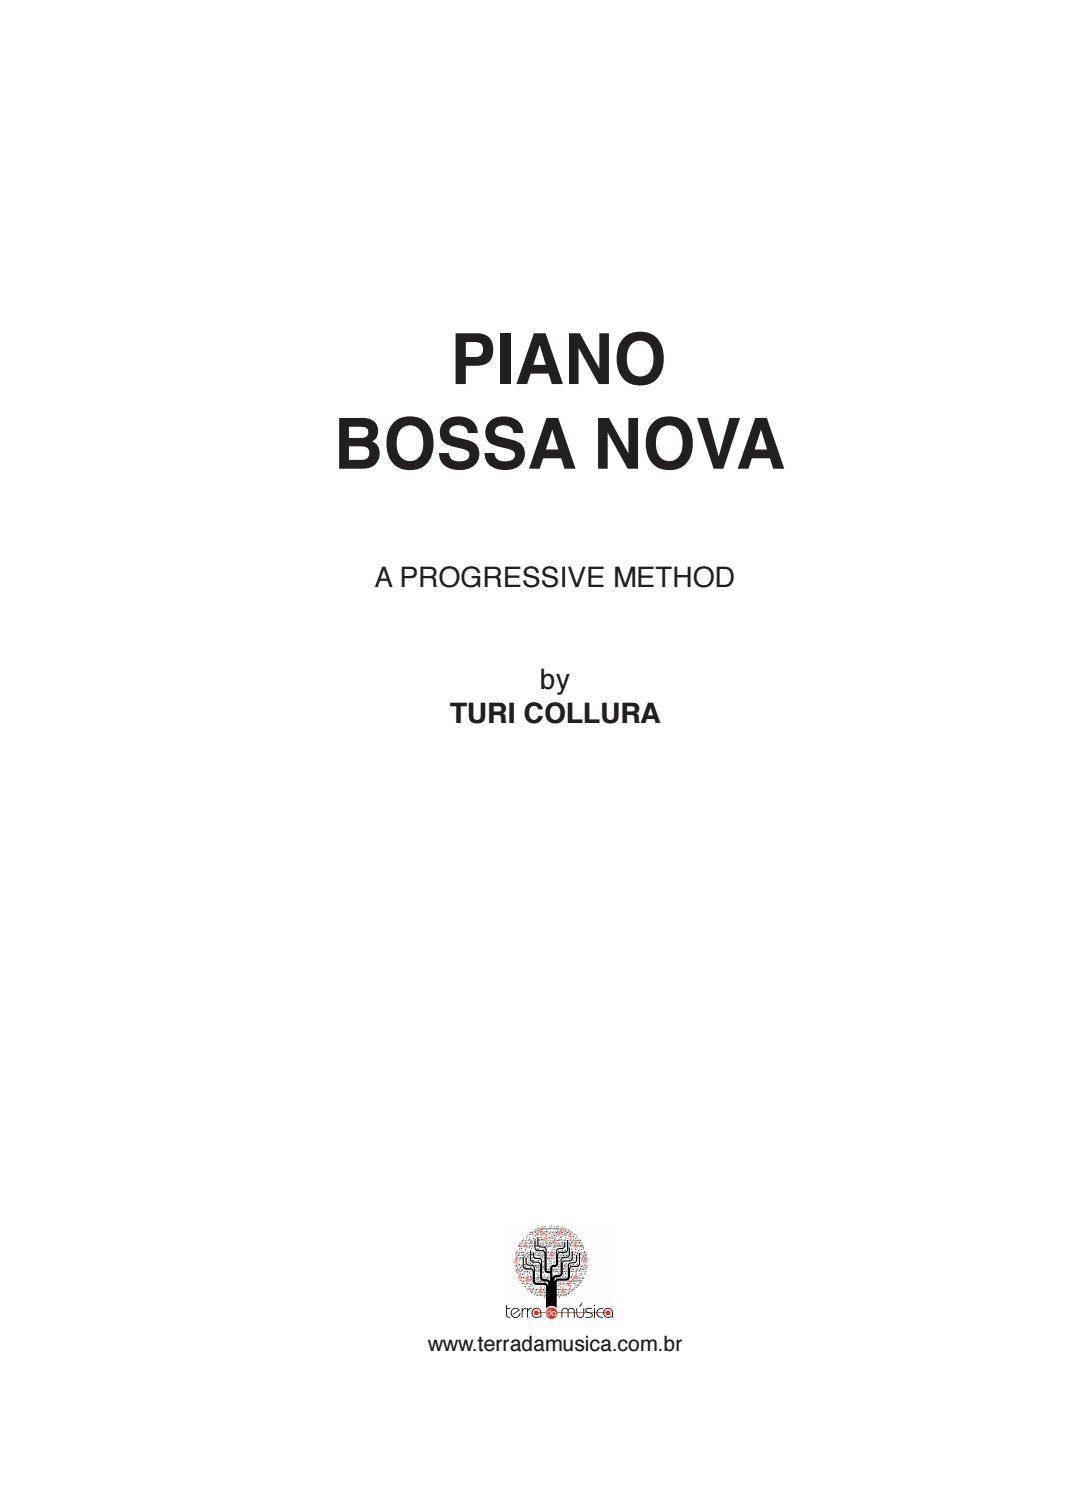 Piano bossa nova progressive method by turi collura issuu biocorpaavc Choice Image